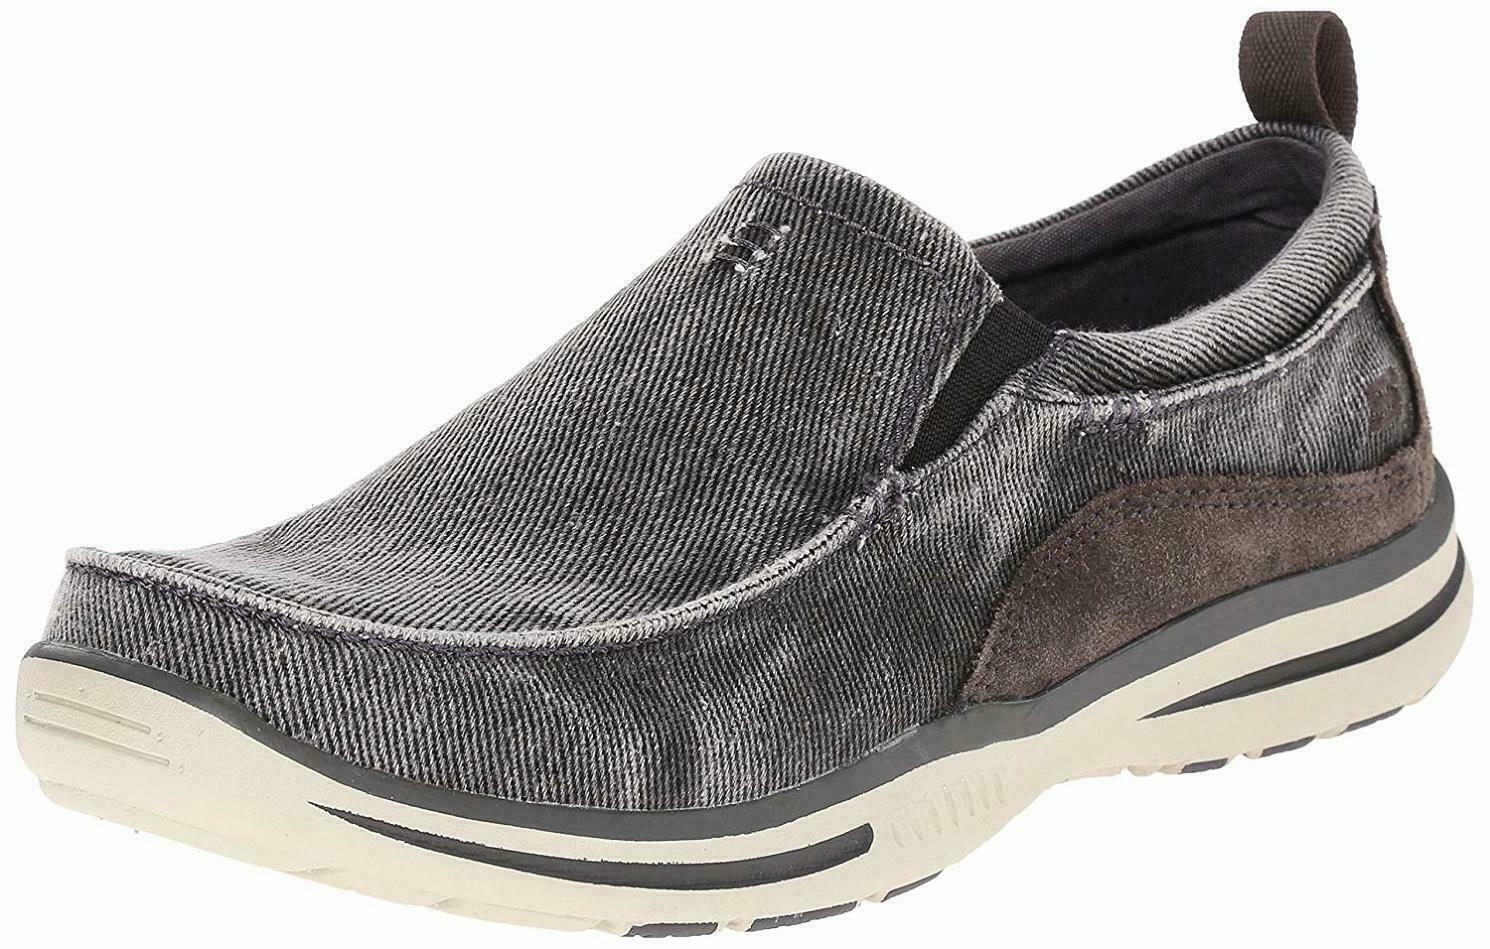 Skechers Men/'s Relaxed Fit Elected Drigo Slip-On Loafer Choose SZ//Color